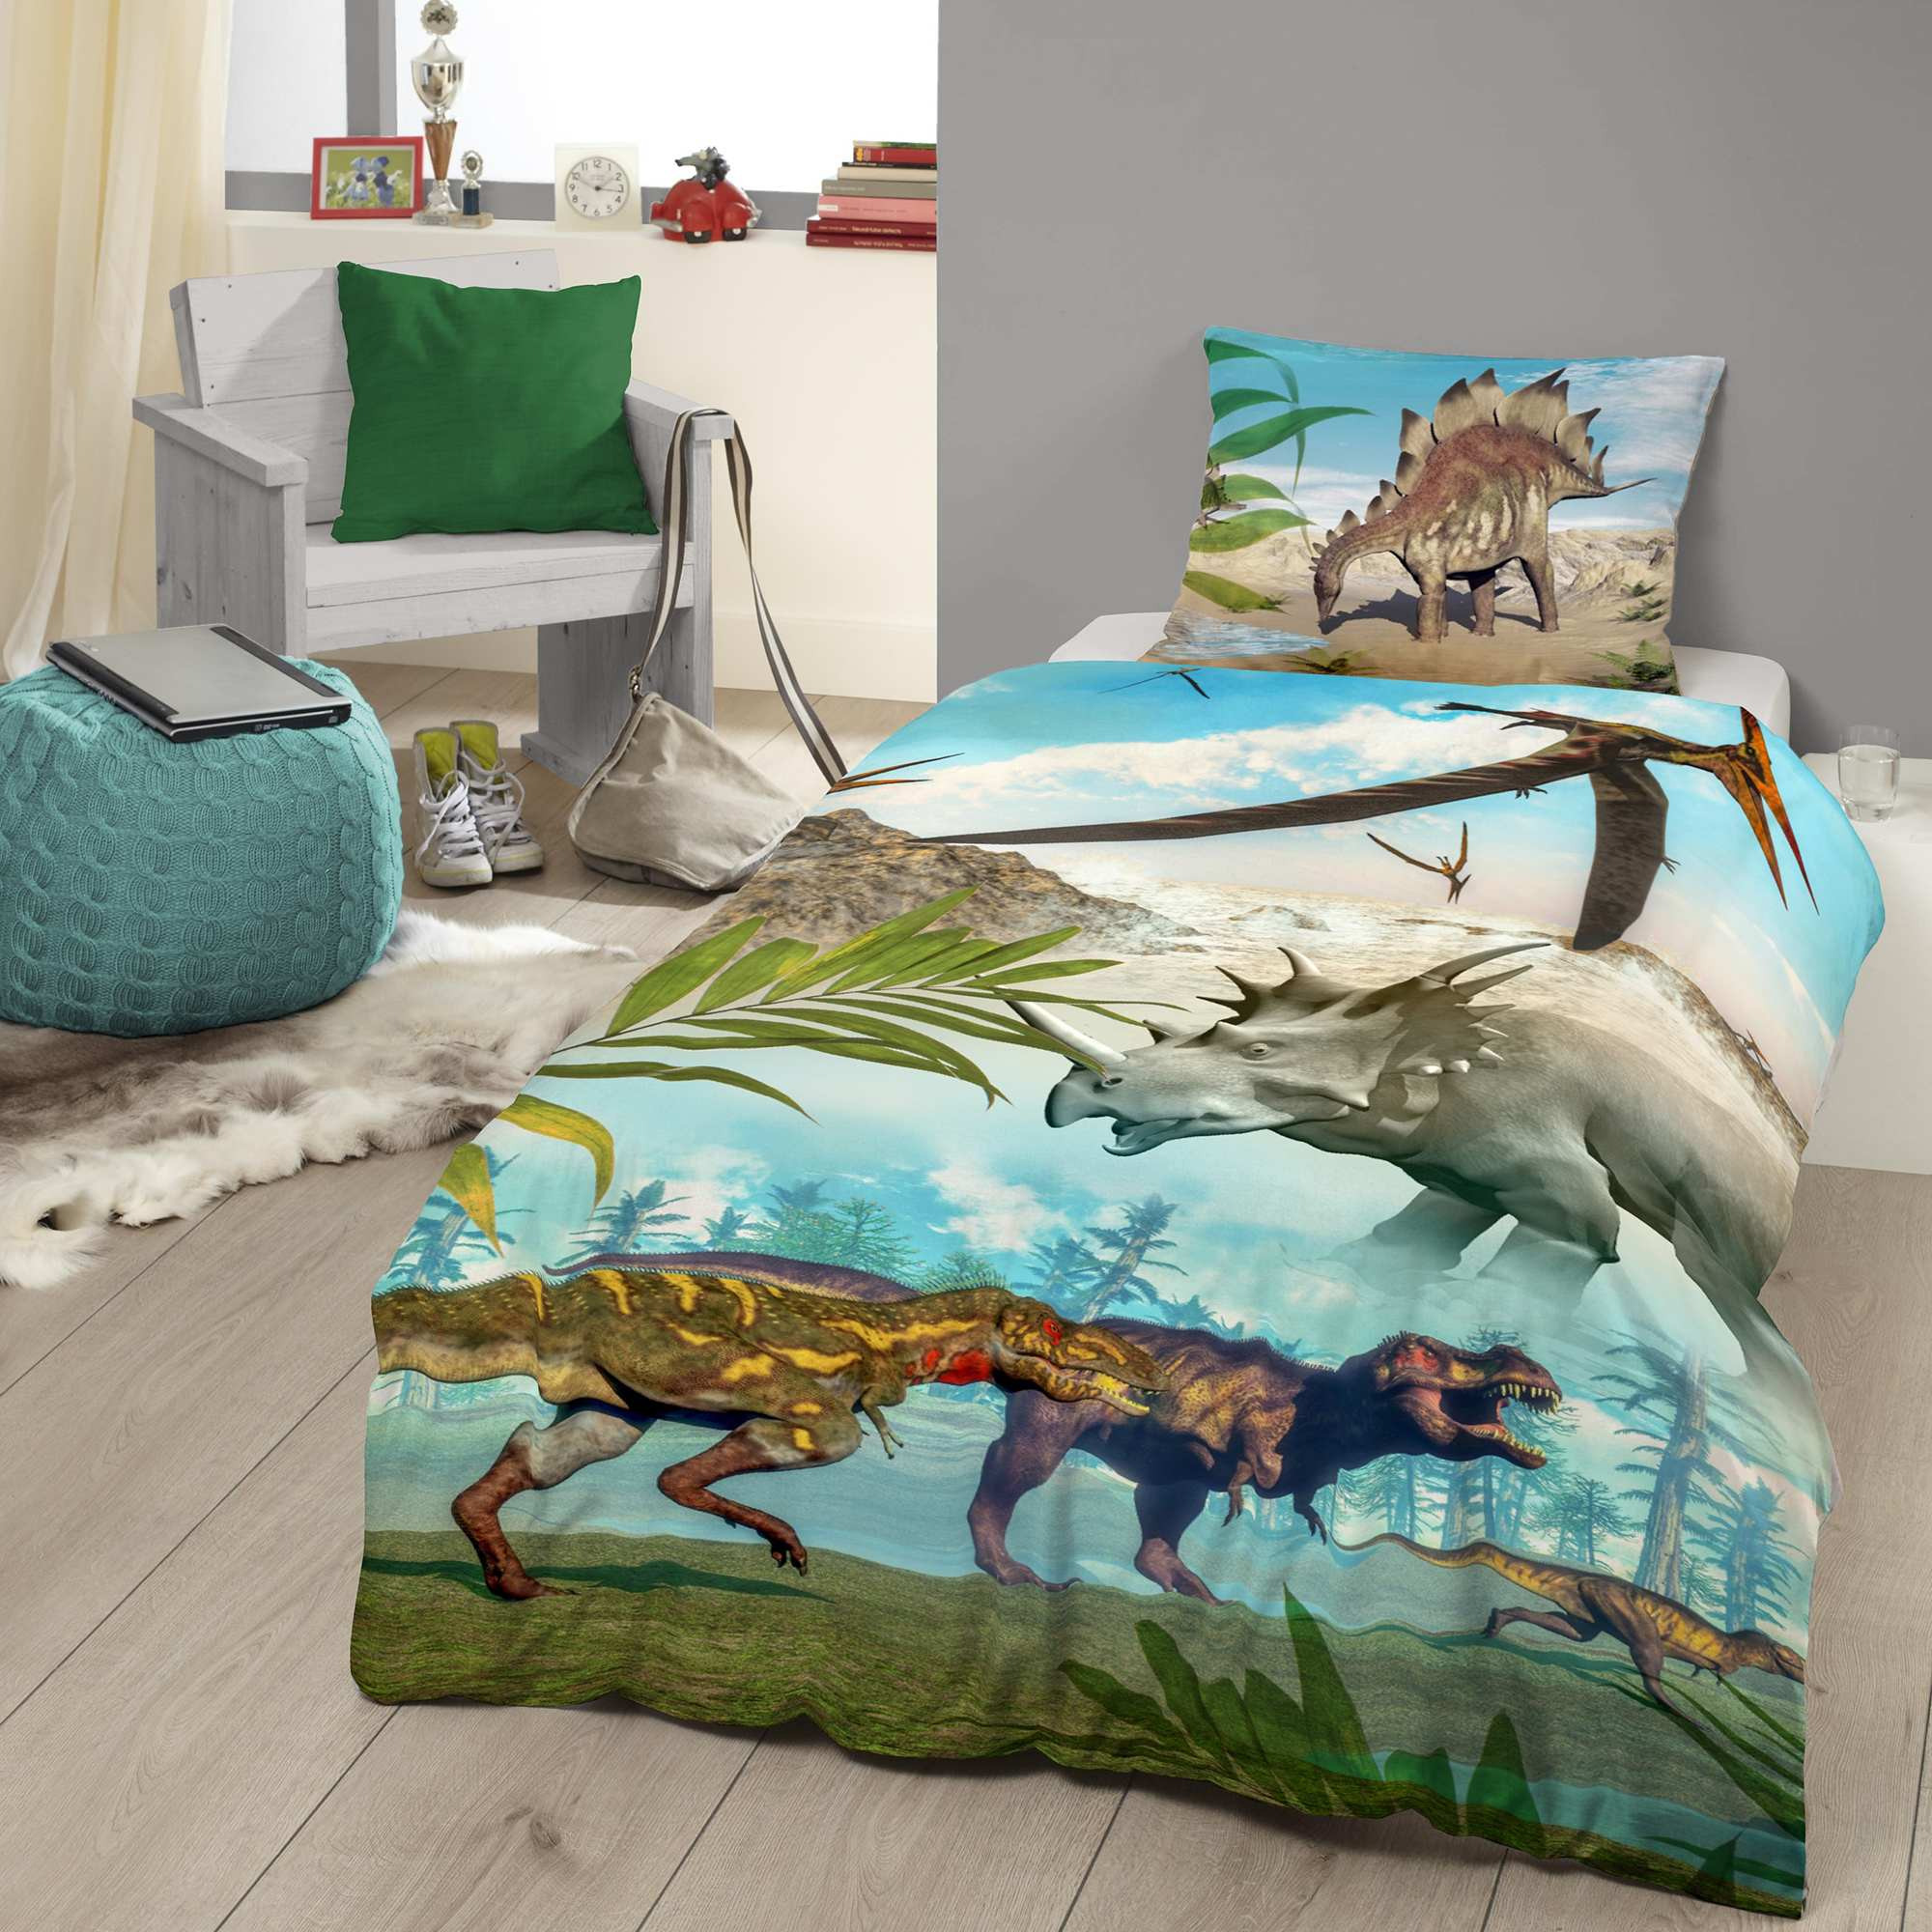 juego de cama con estampado de 39 dinosaurios 39 hogar bleu vert kiabi 25 00. Black Bedroom Furniture Sets. Home Design Ideas